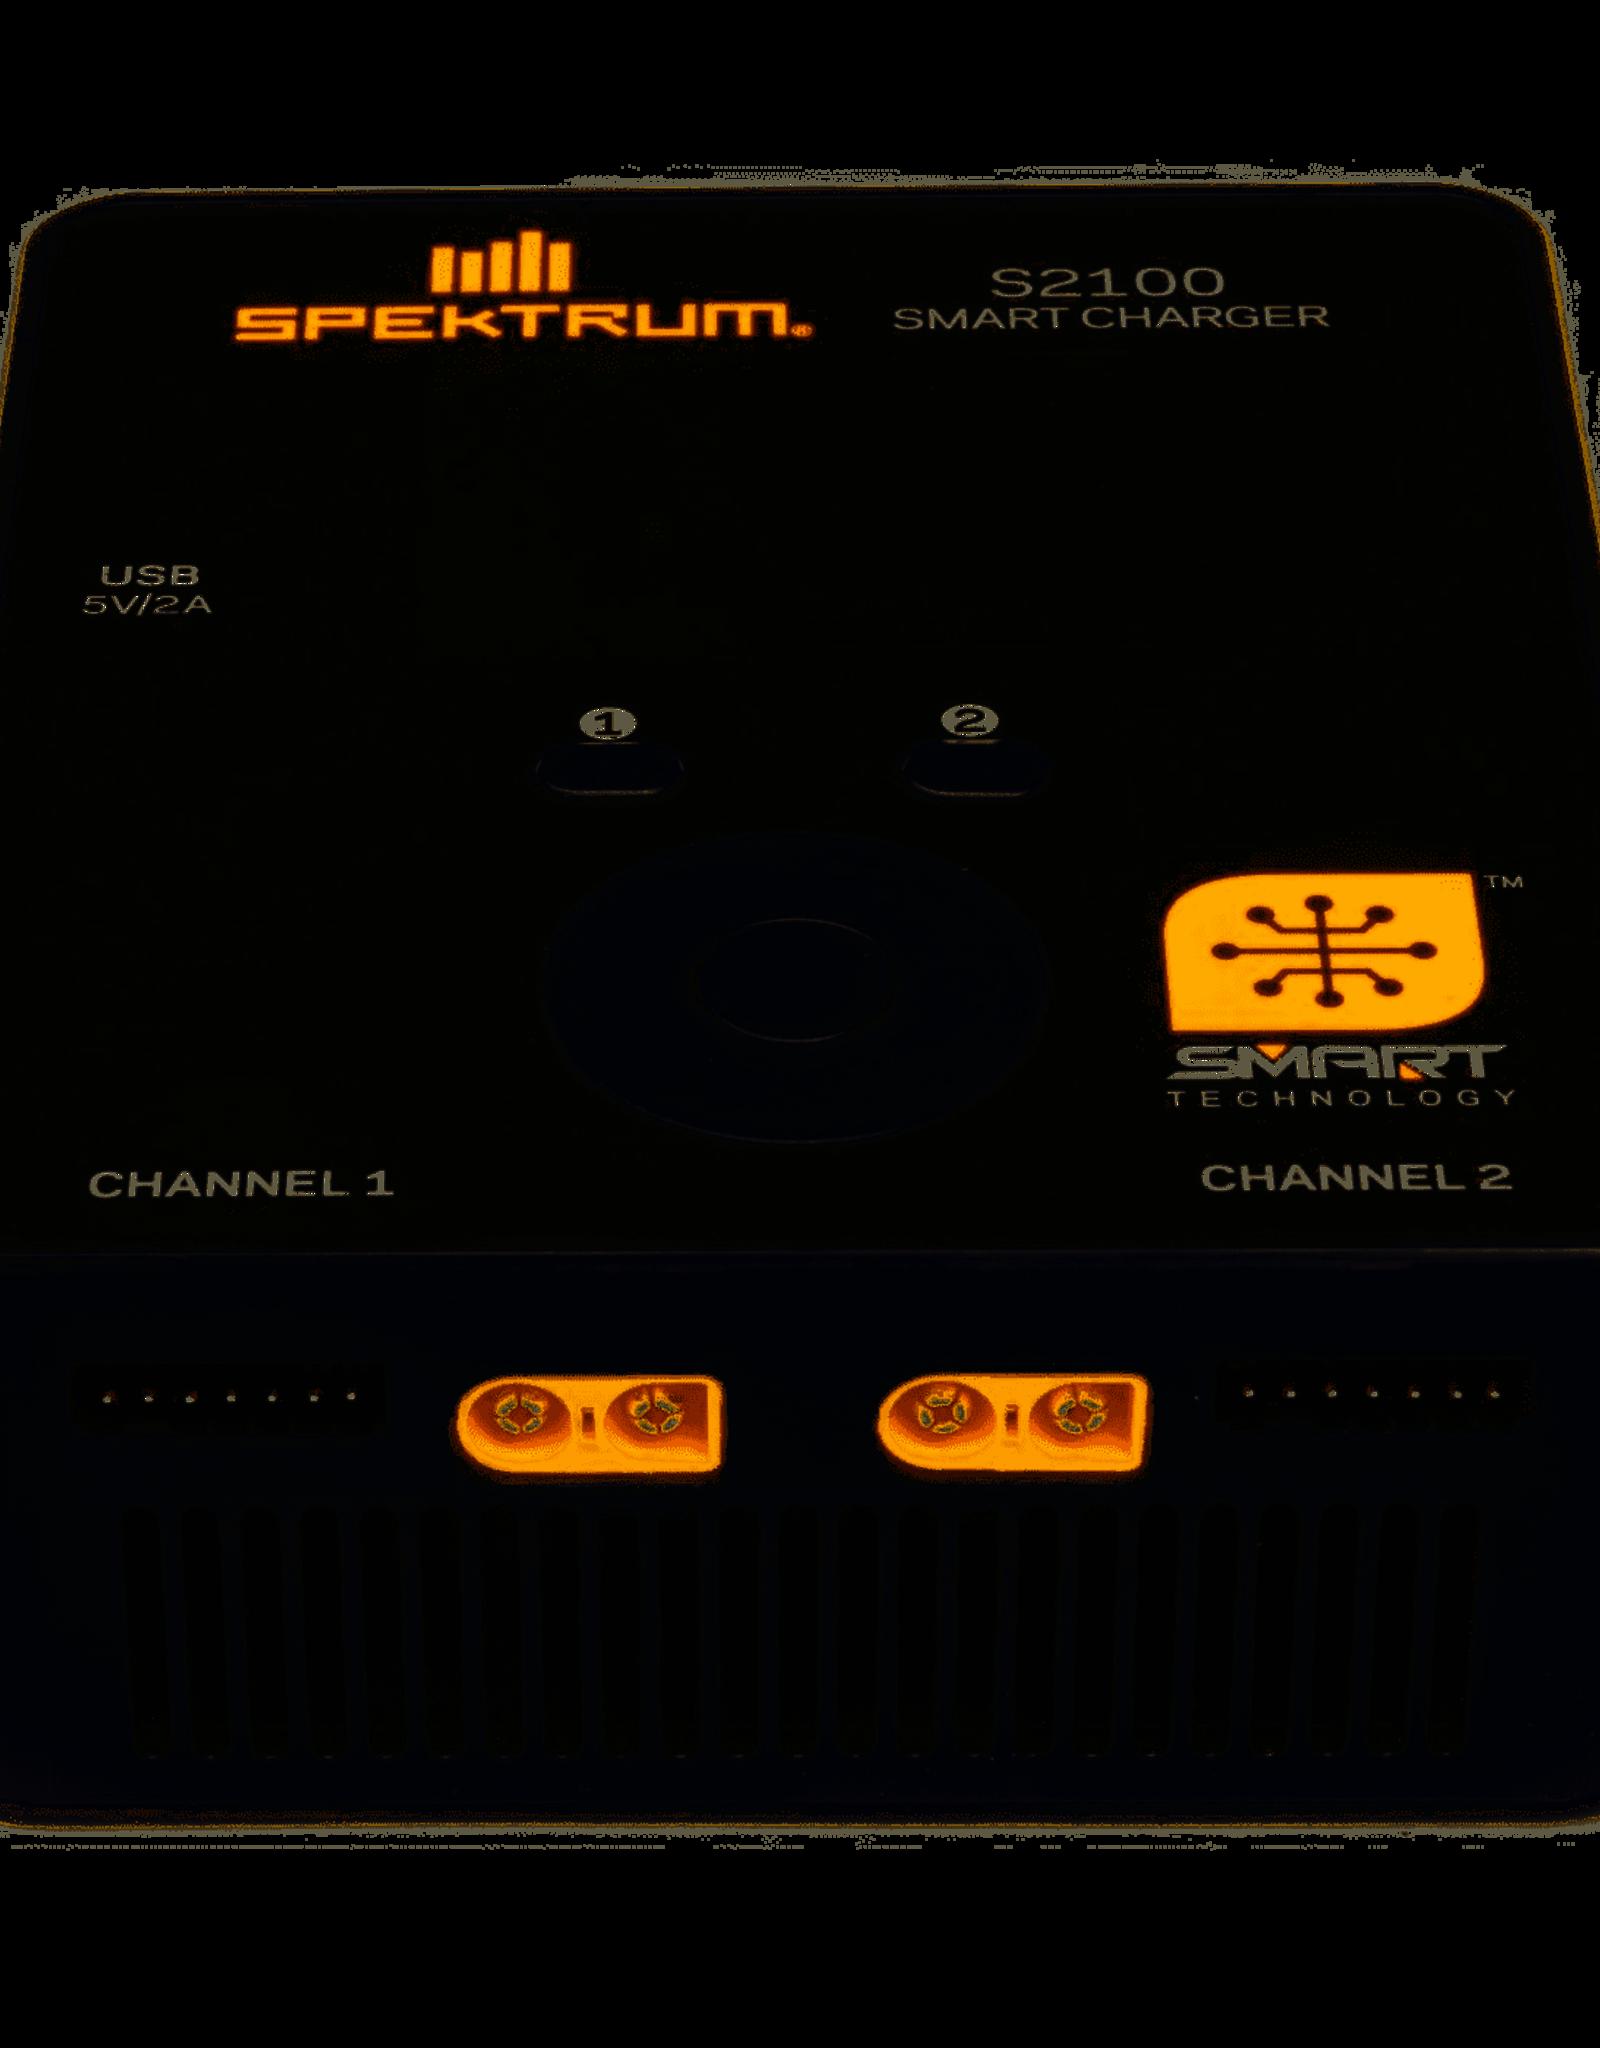 Spektrum Smart S2100 AC Charger, 2X100W